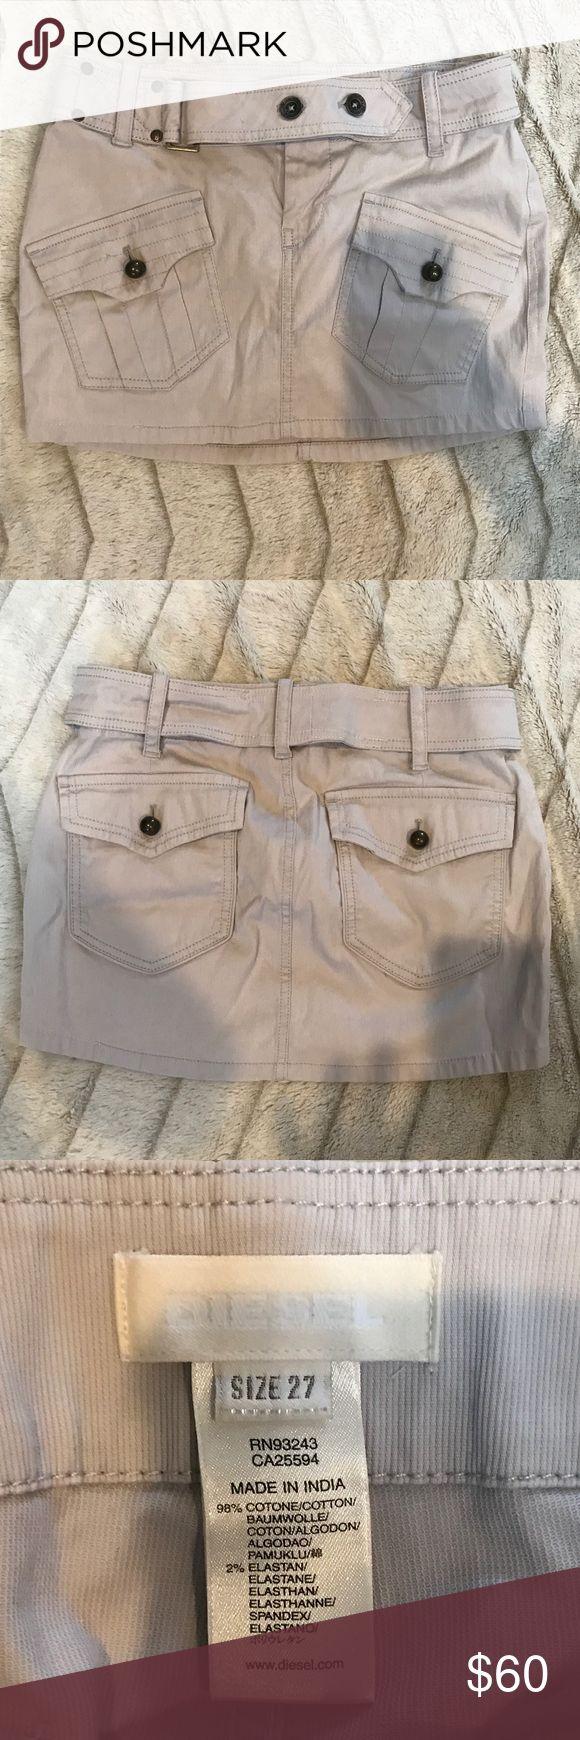 Diesel Cargo Mini Skirt For sale is a Diesel Cargo Mini Skirt in VGUC.  Color is a Taupe-ish grey (greige) size:27 Diesel Skirts Mini